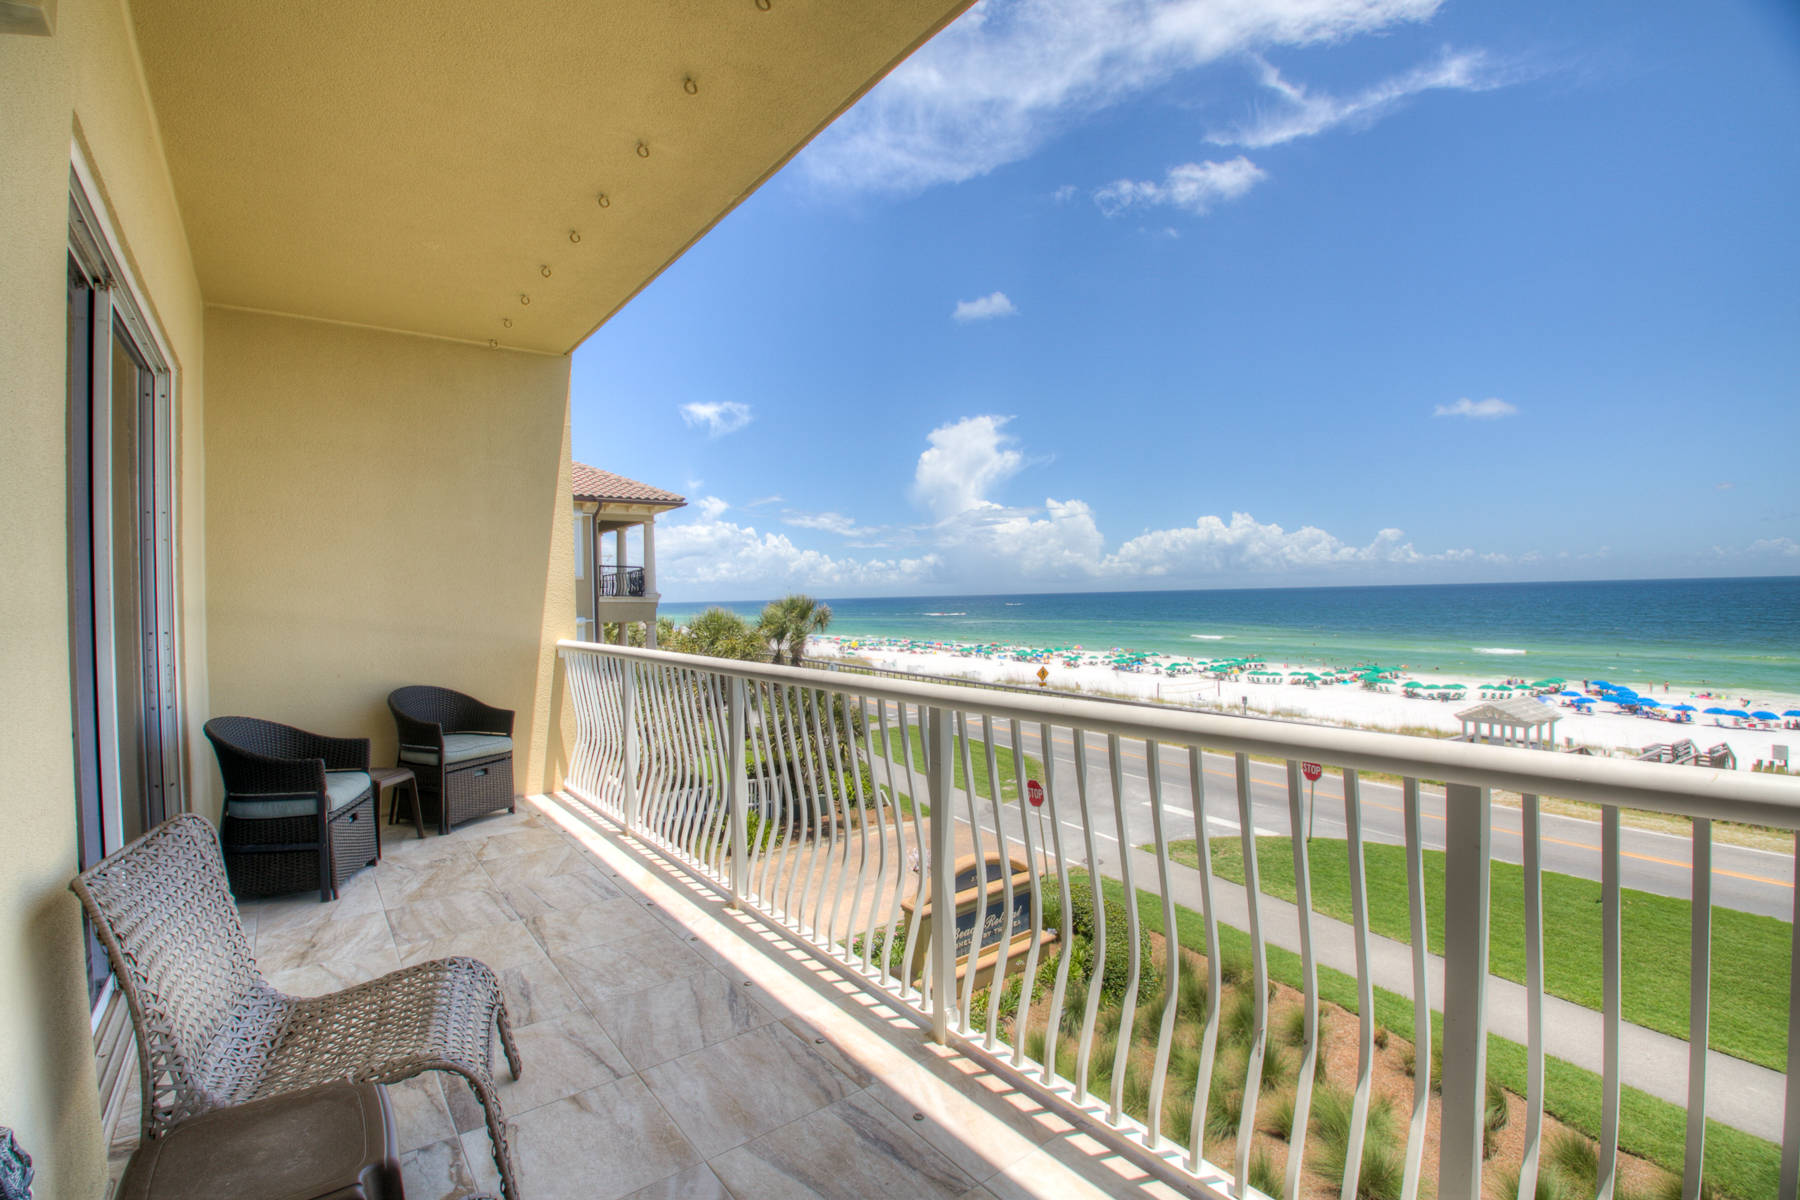 Beach Retreat 308 2 Bedroom Vacation Condos On The